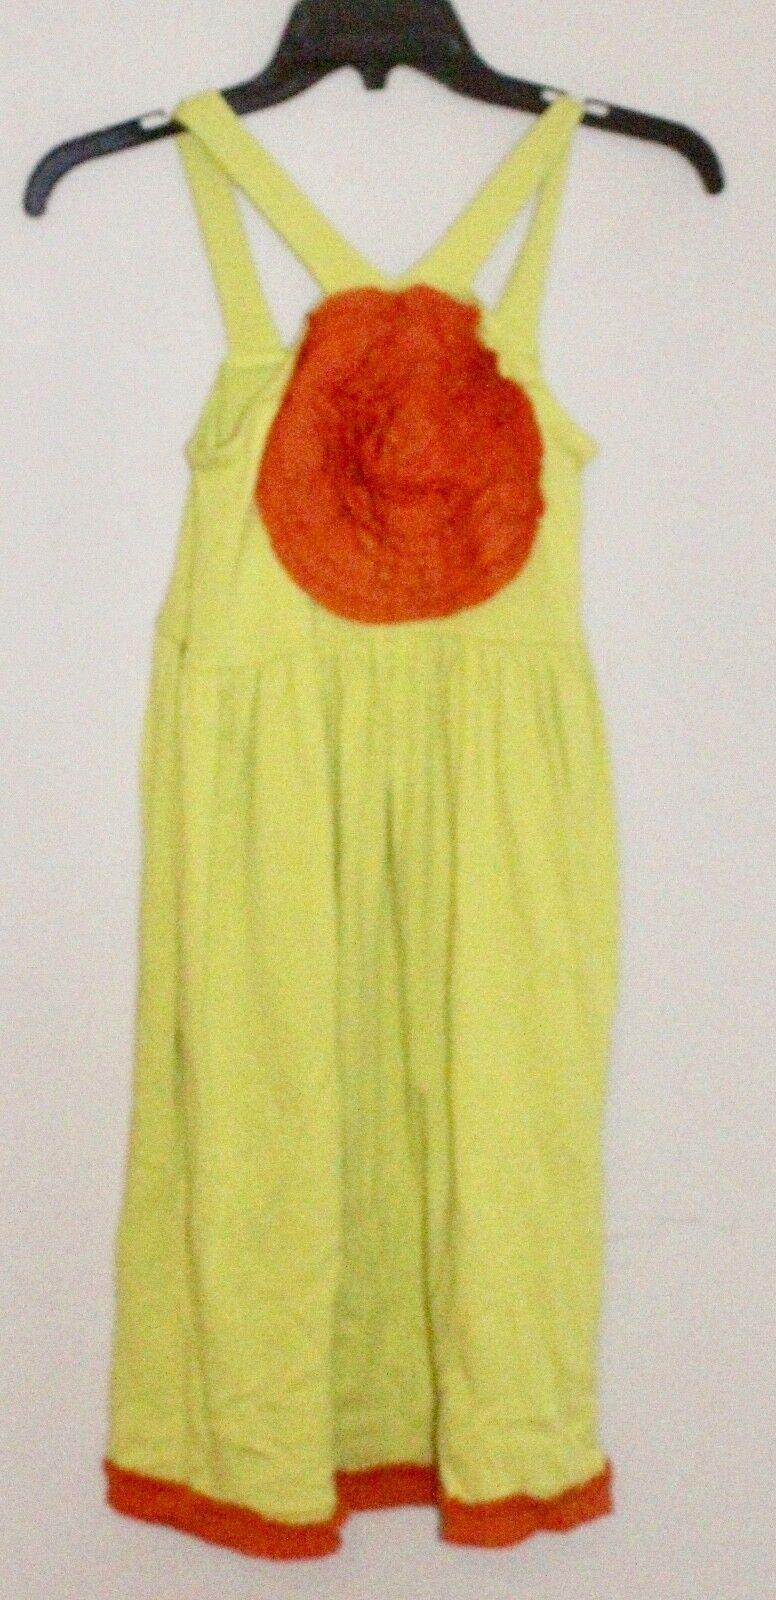 Sam And Sydney Size 10 Girls Green/ Orange Flower Dress Floral Boutique NWT